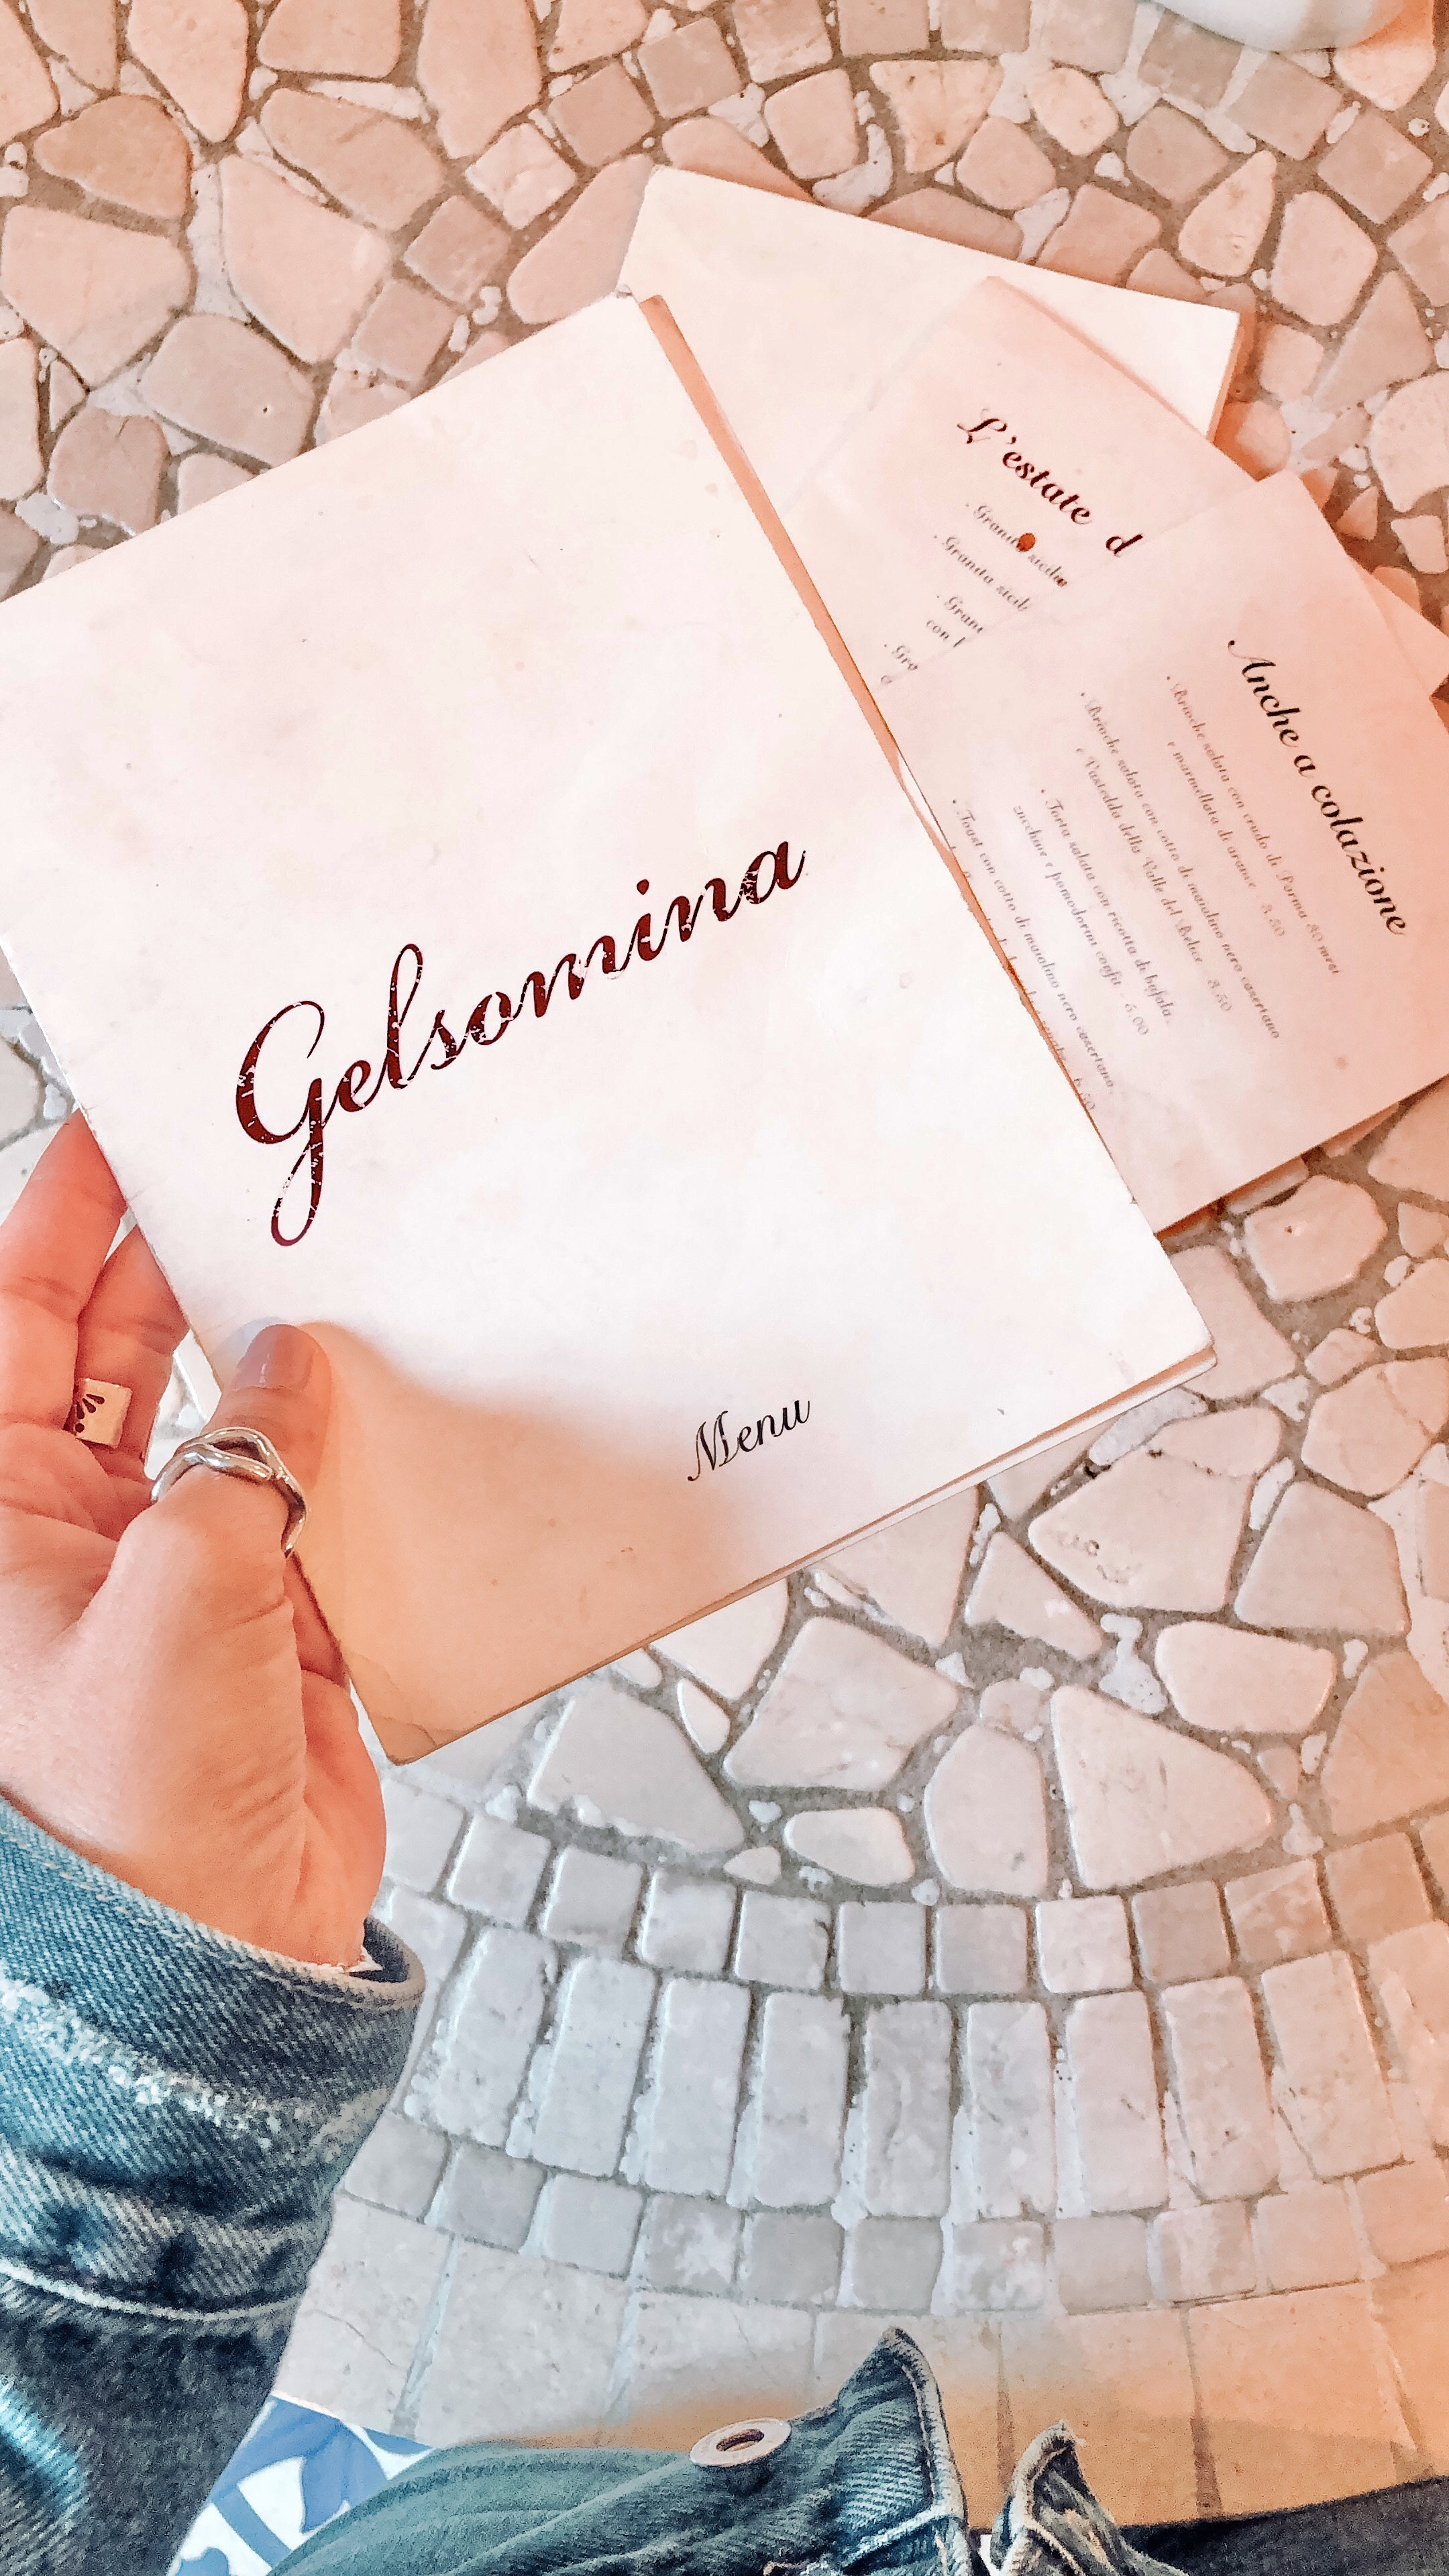 Gelsomina, posti per la colazione a Milano, Milano colazione, Milano food, Milano breakfast, breakfast in Milan, travel in Milan